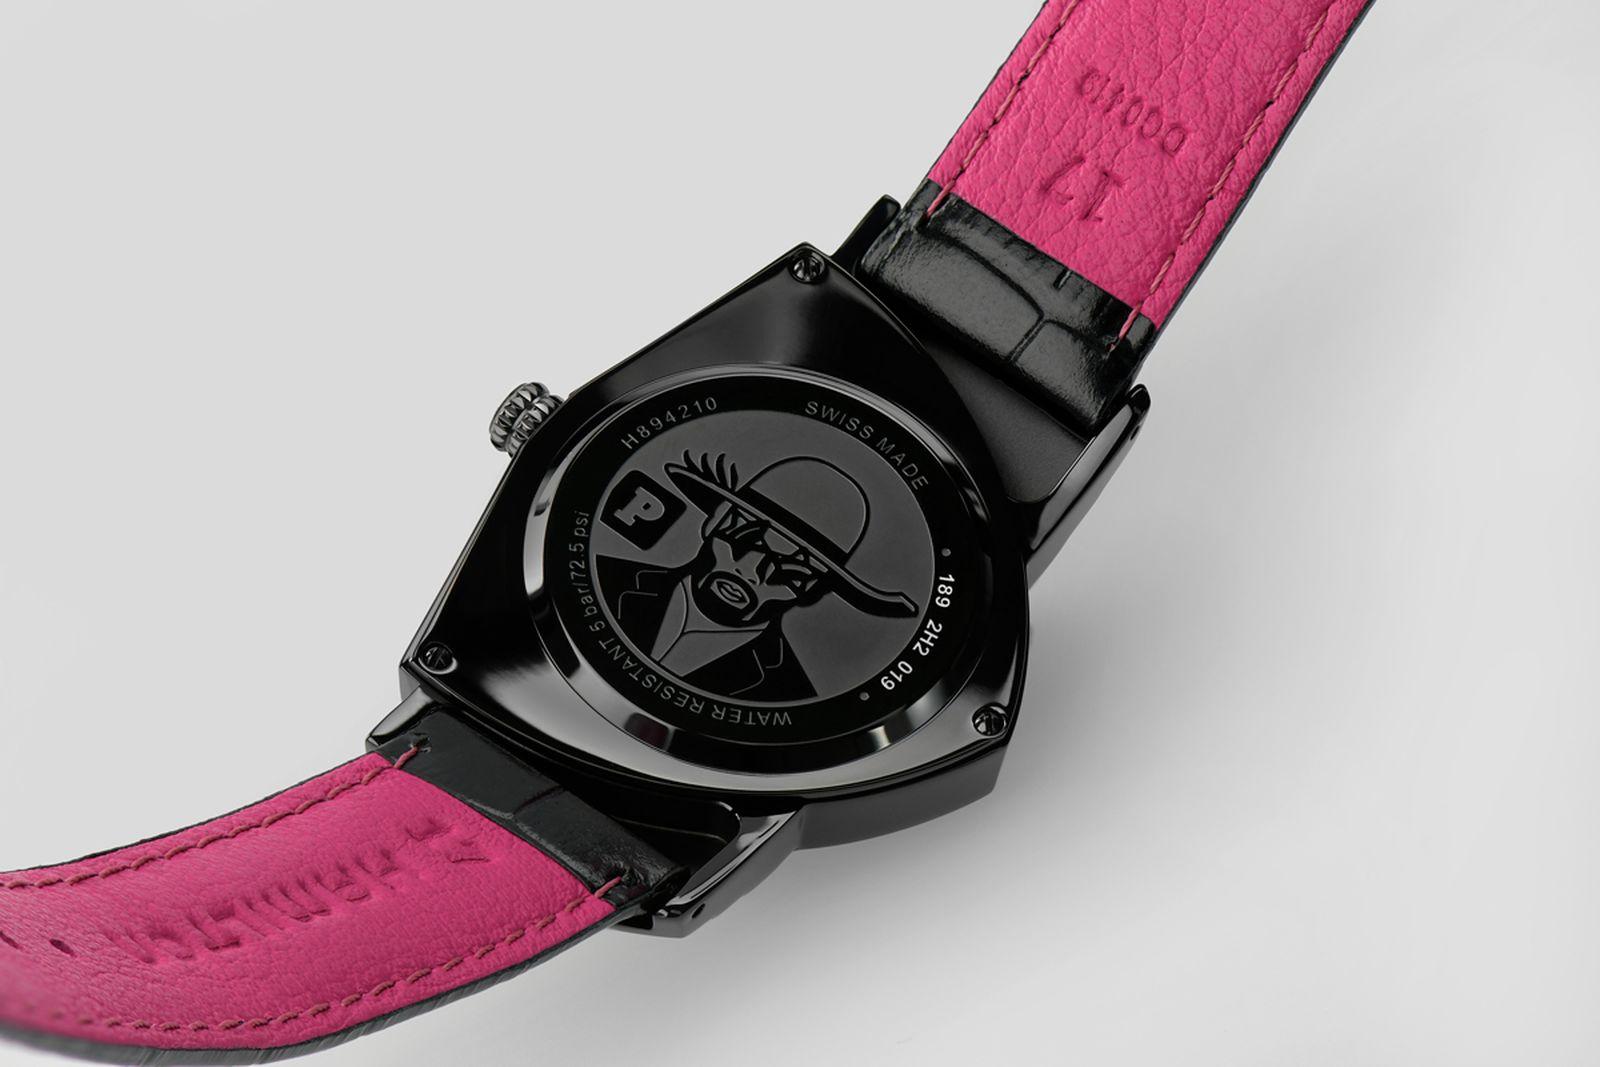 poggy-the-man-hamilton-watch-collab-04